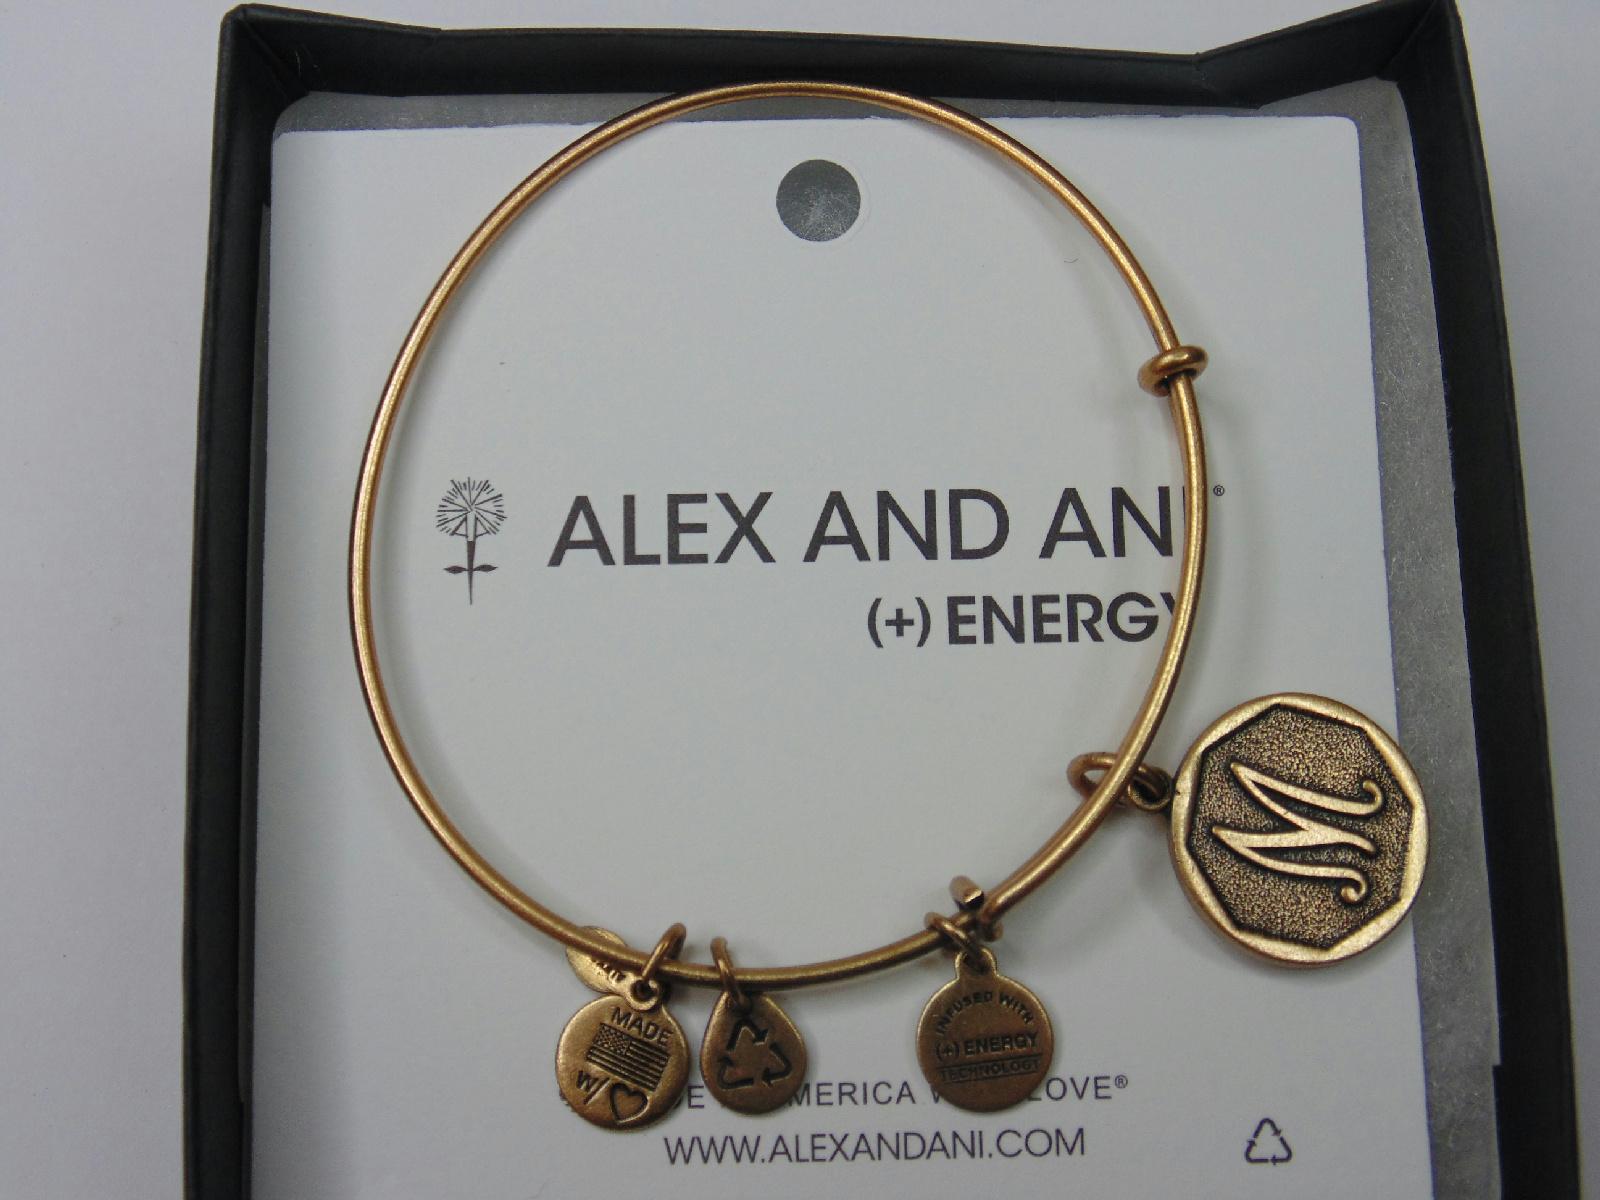 alex and ani positive energy jewelry bangle bracelet charm